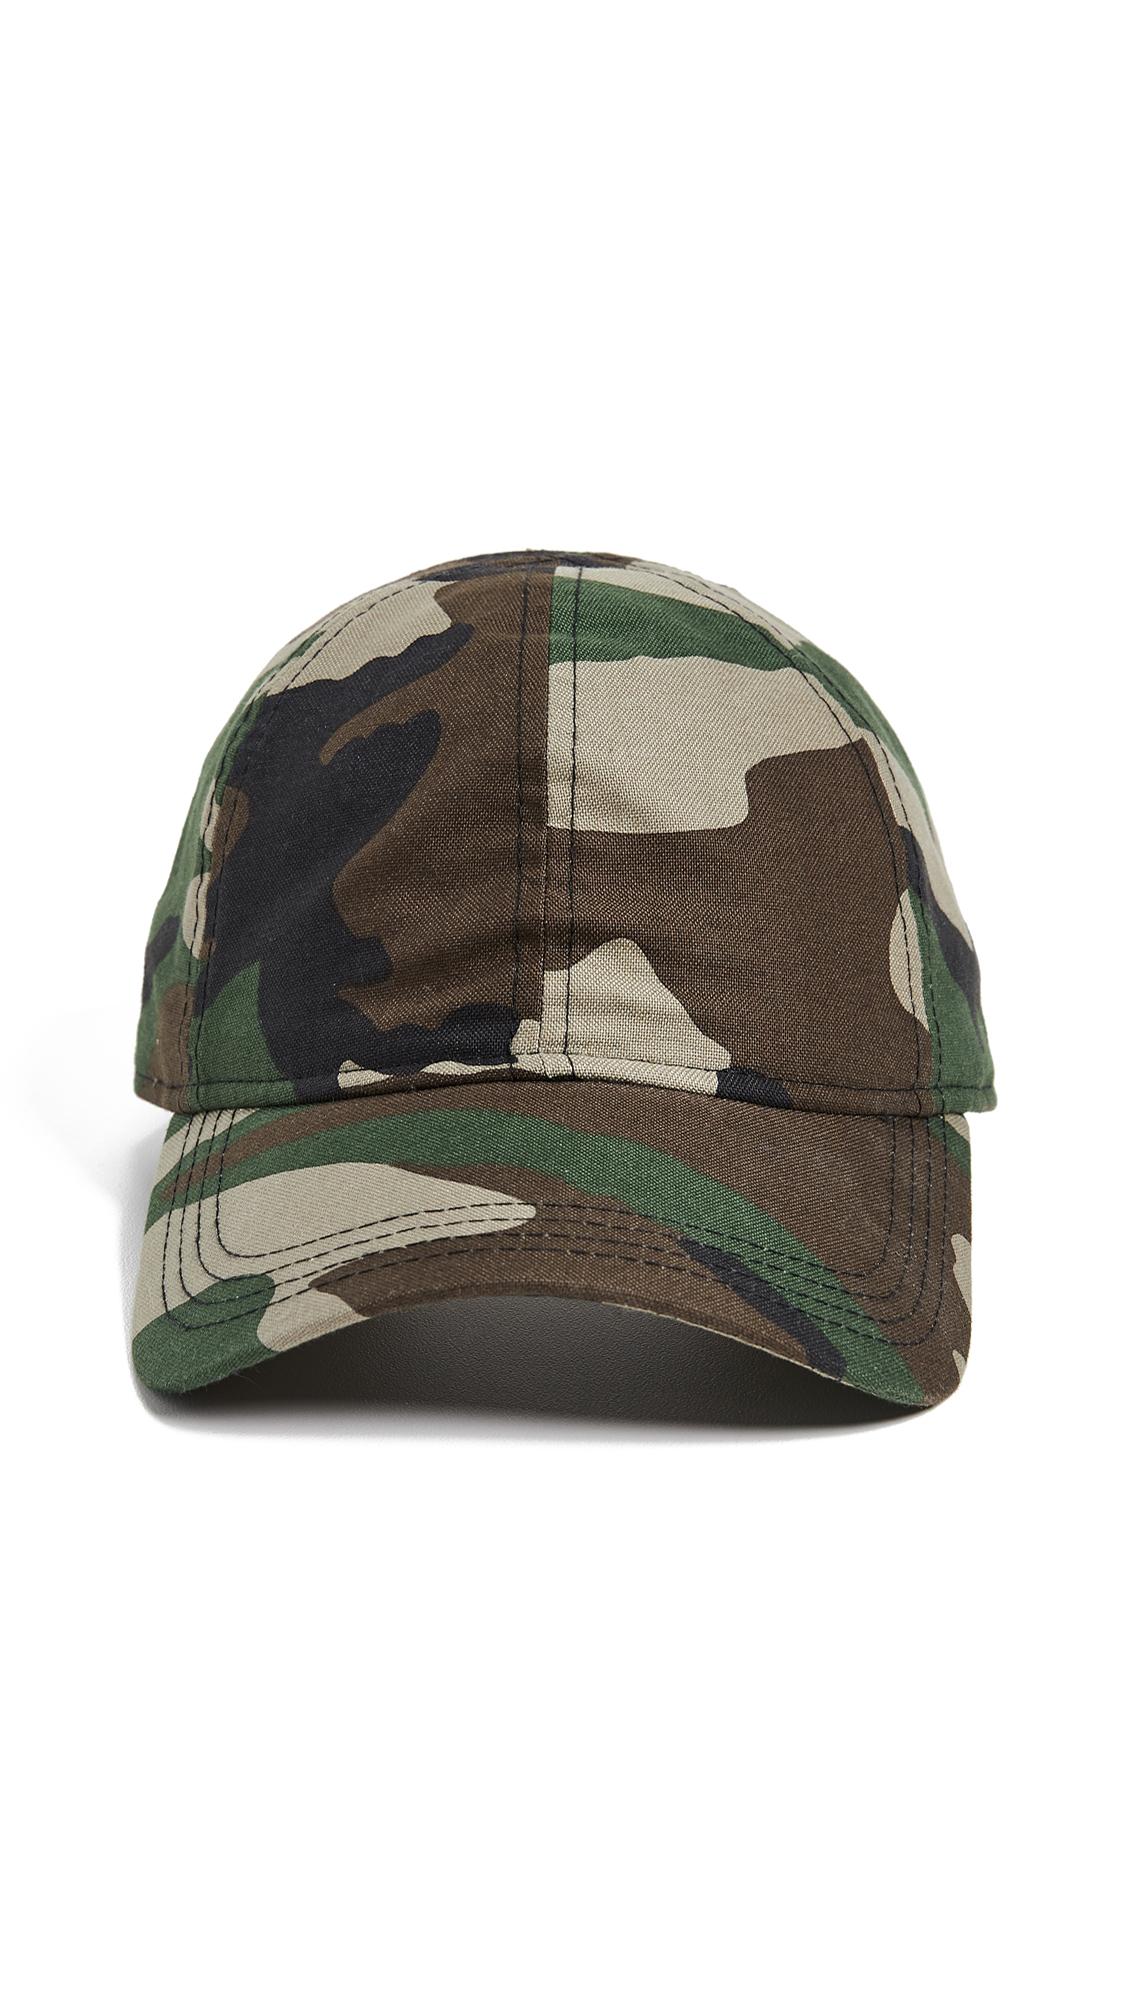 New Era 9Twenty Baseball Hat In Camo